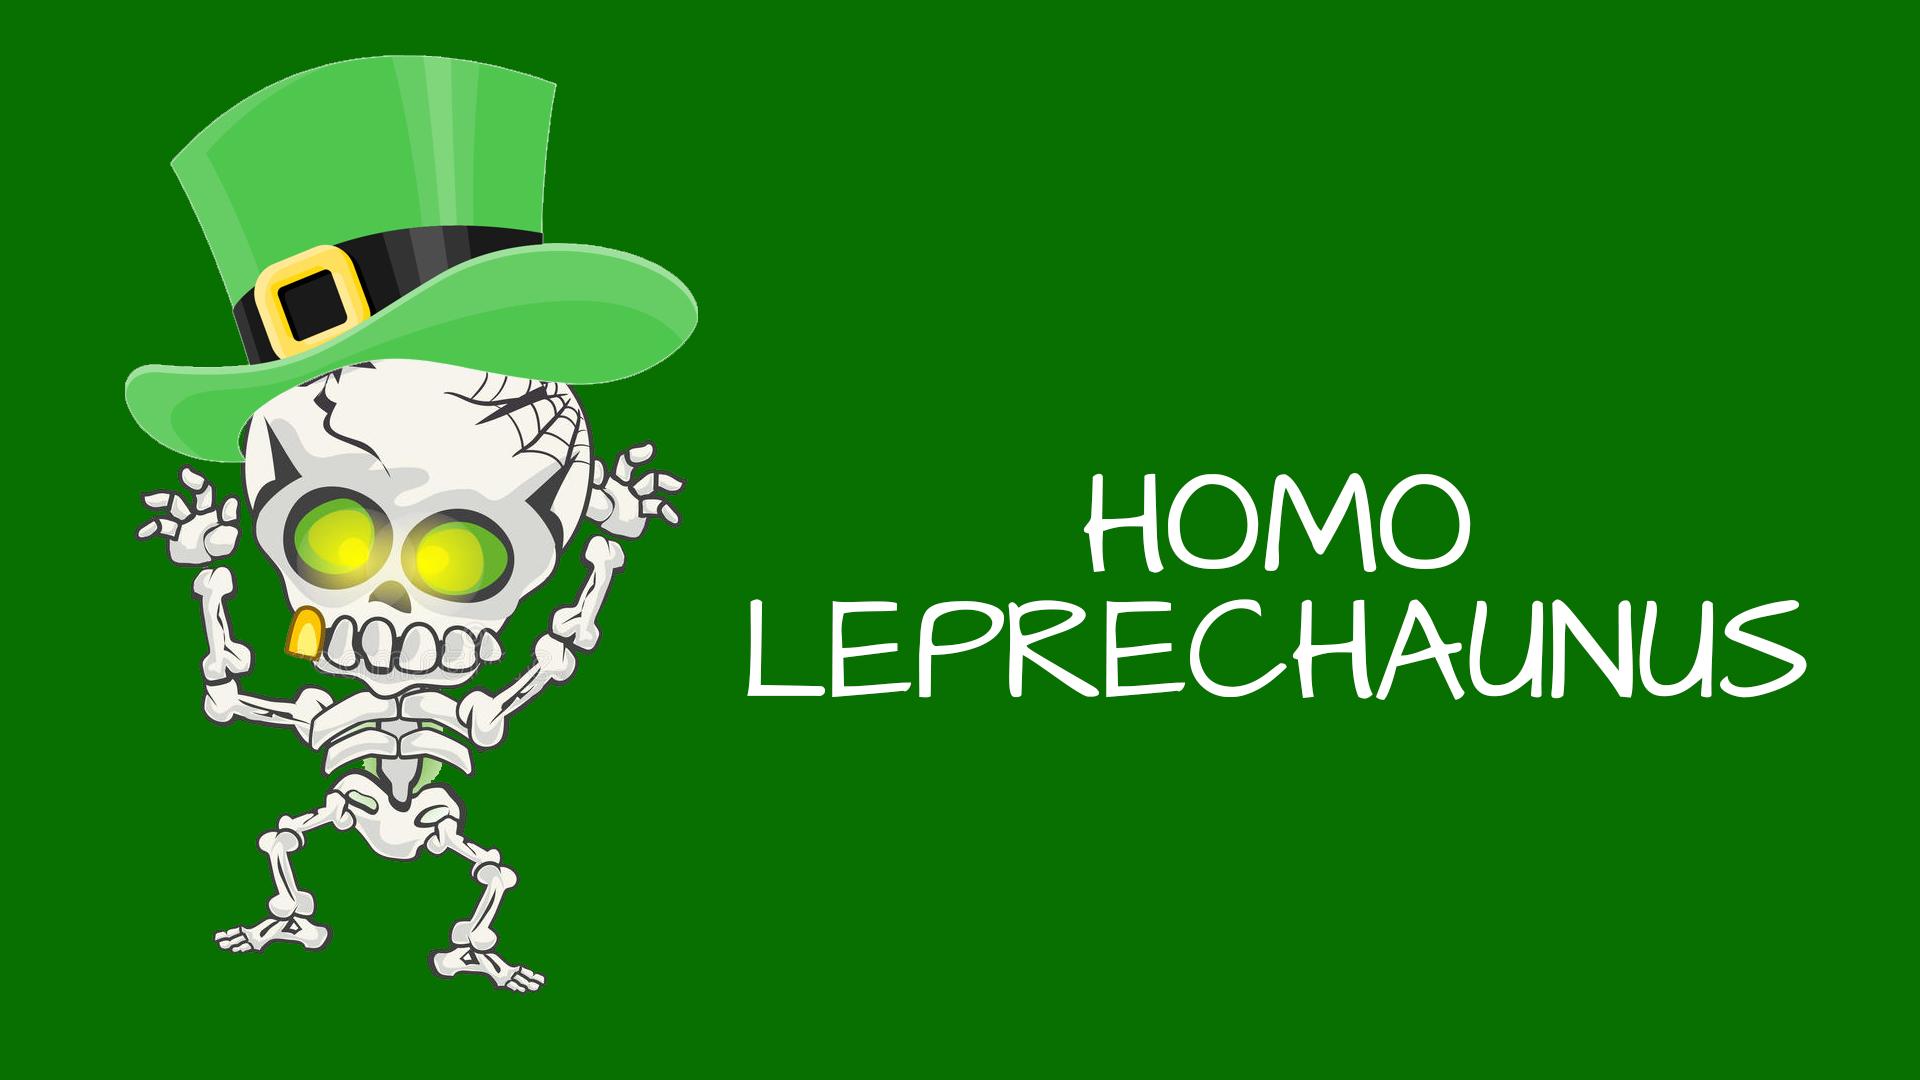 HOMO-LEPRECHAUNUS